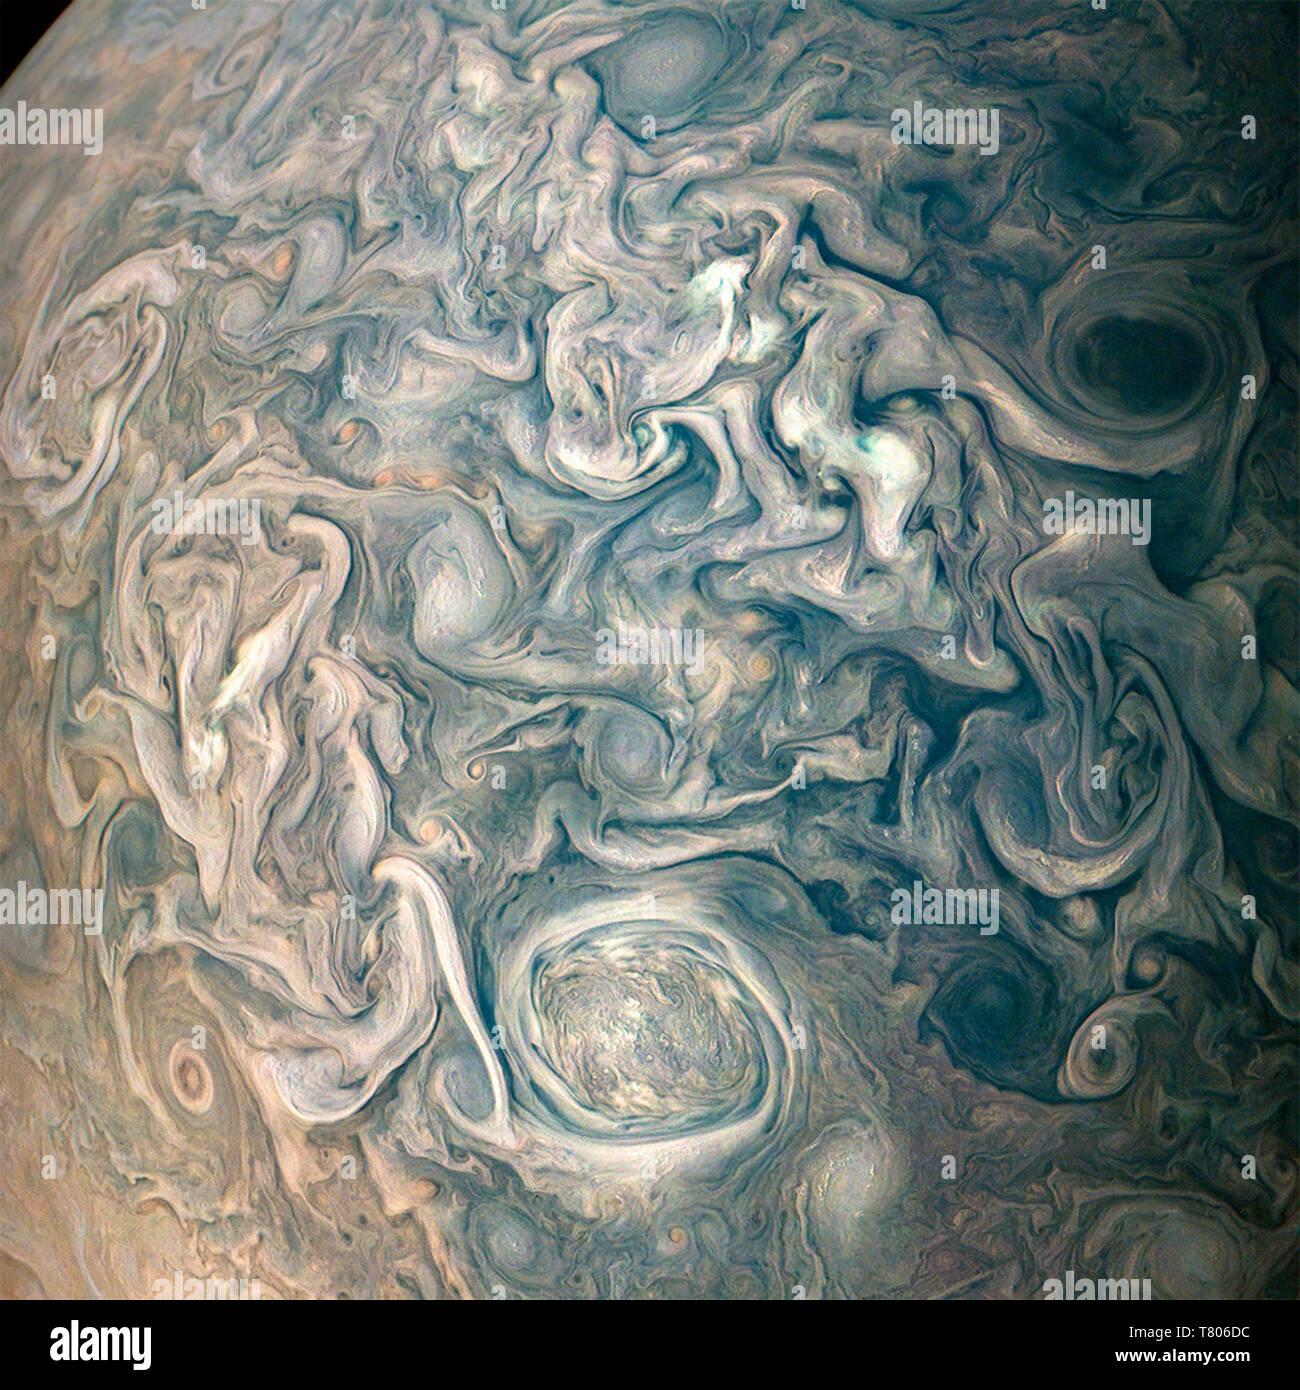 Jupiter's Swirling Clouds, Northern Hemisphere - Stock Image